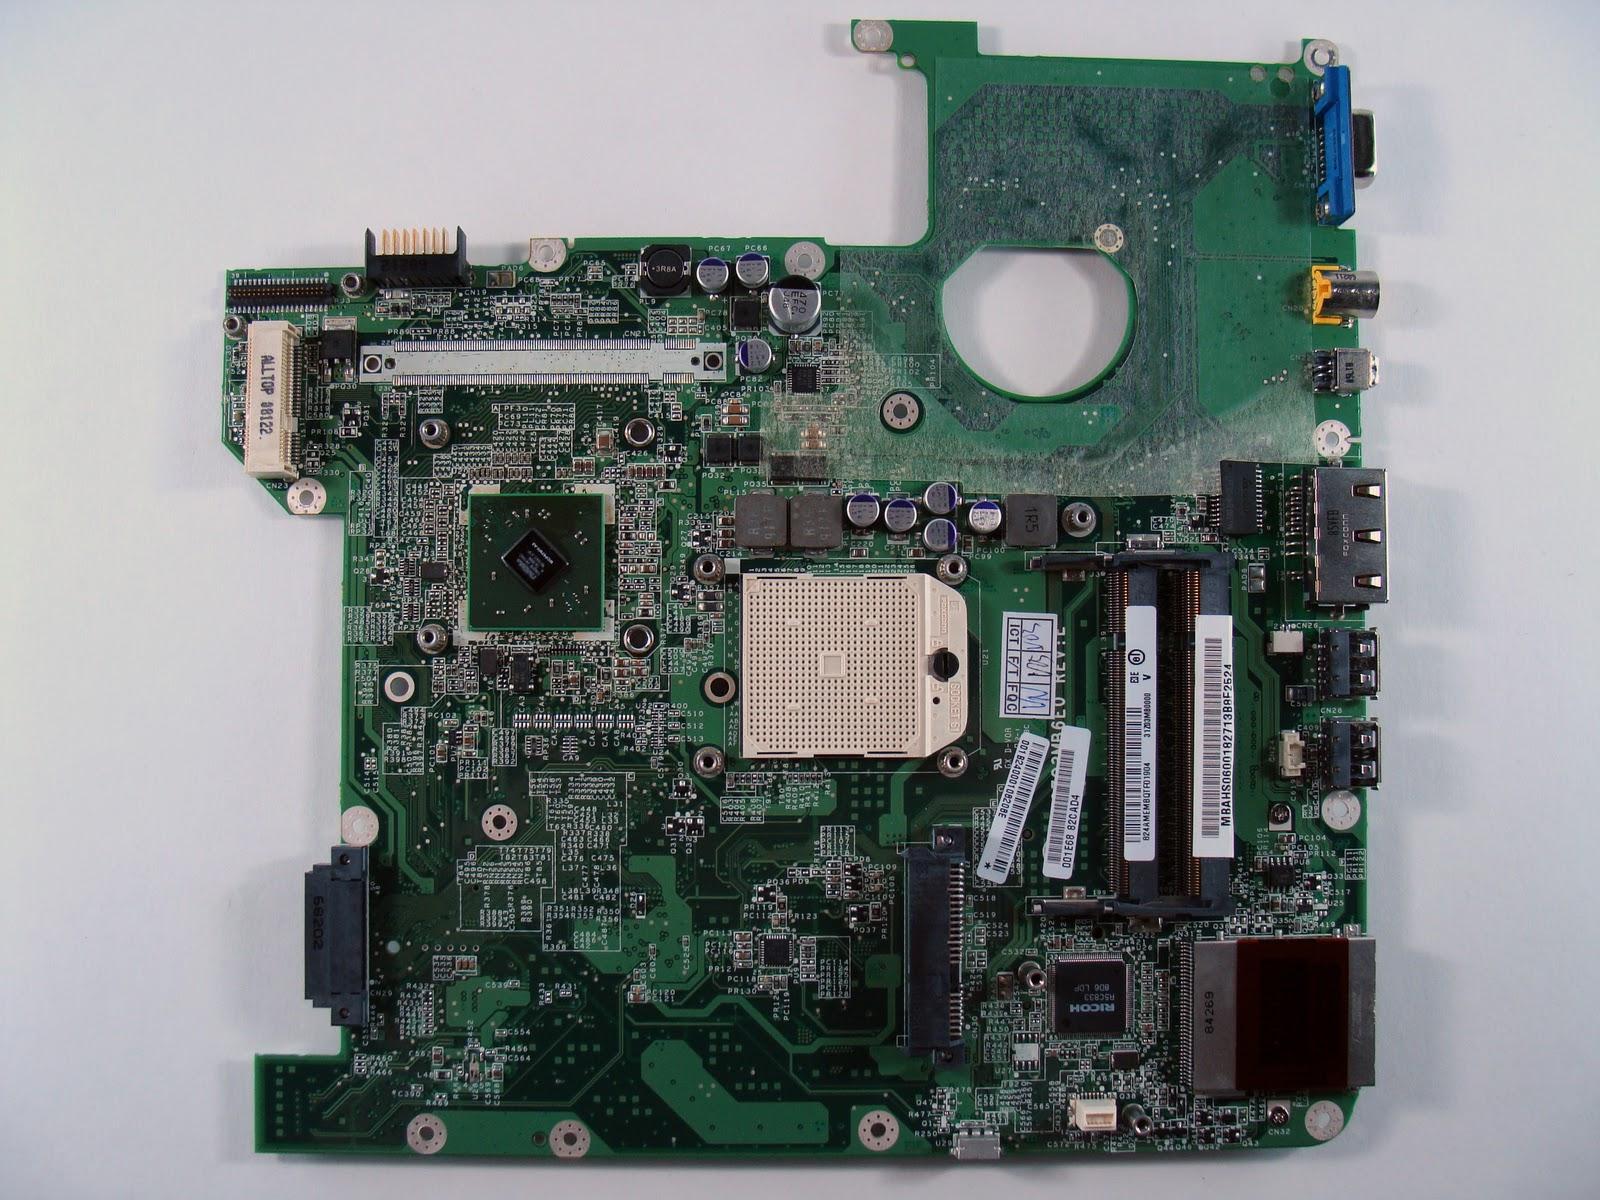 Repair Motherboard Hp Pavilion Ze4900 Laptop Schematic Diagram Acer Aspire 4520